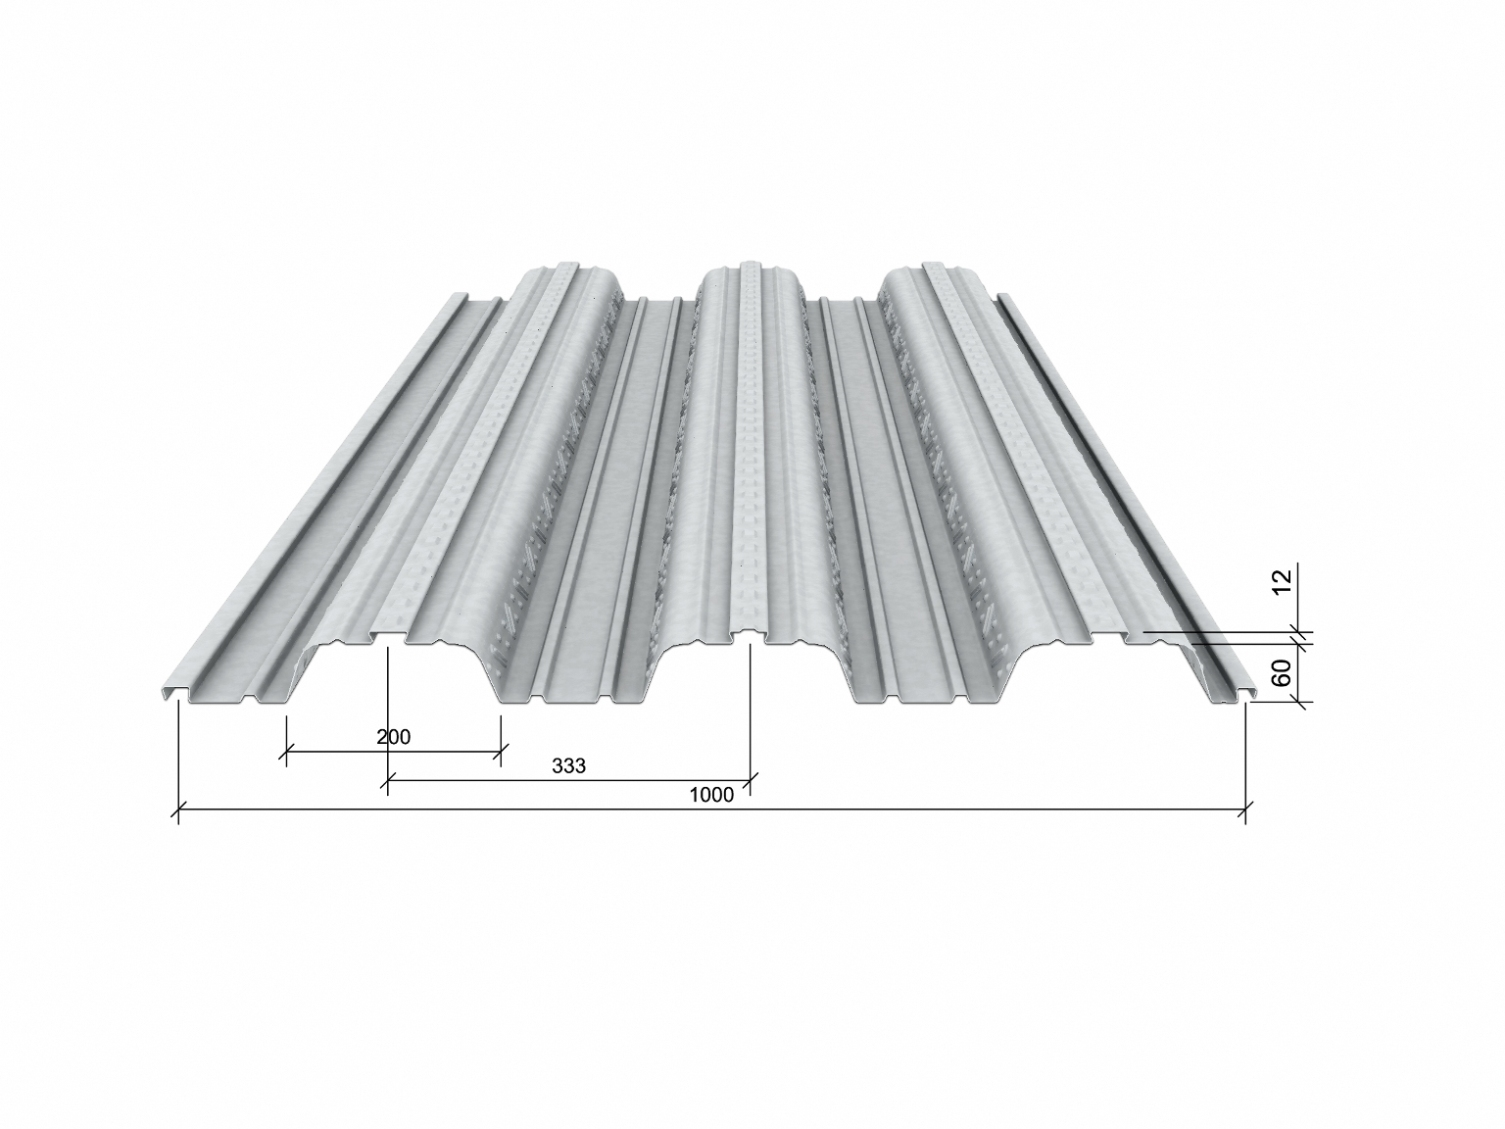 structural metal decks ltd